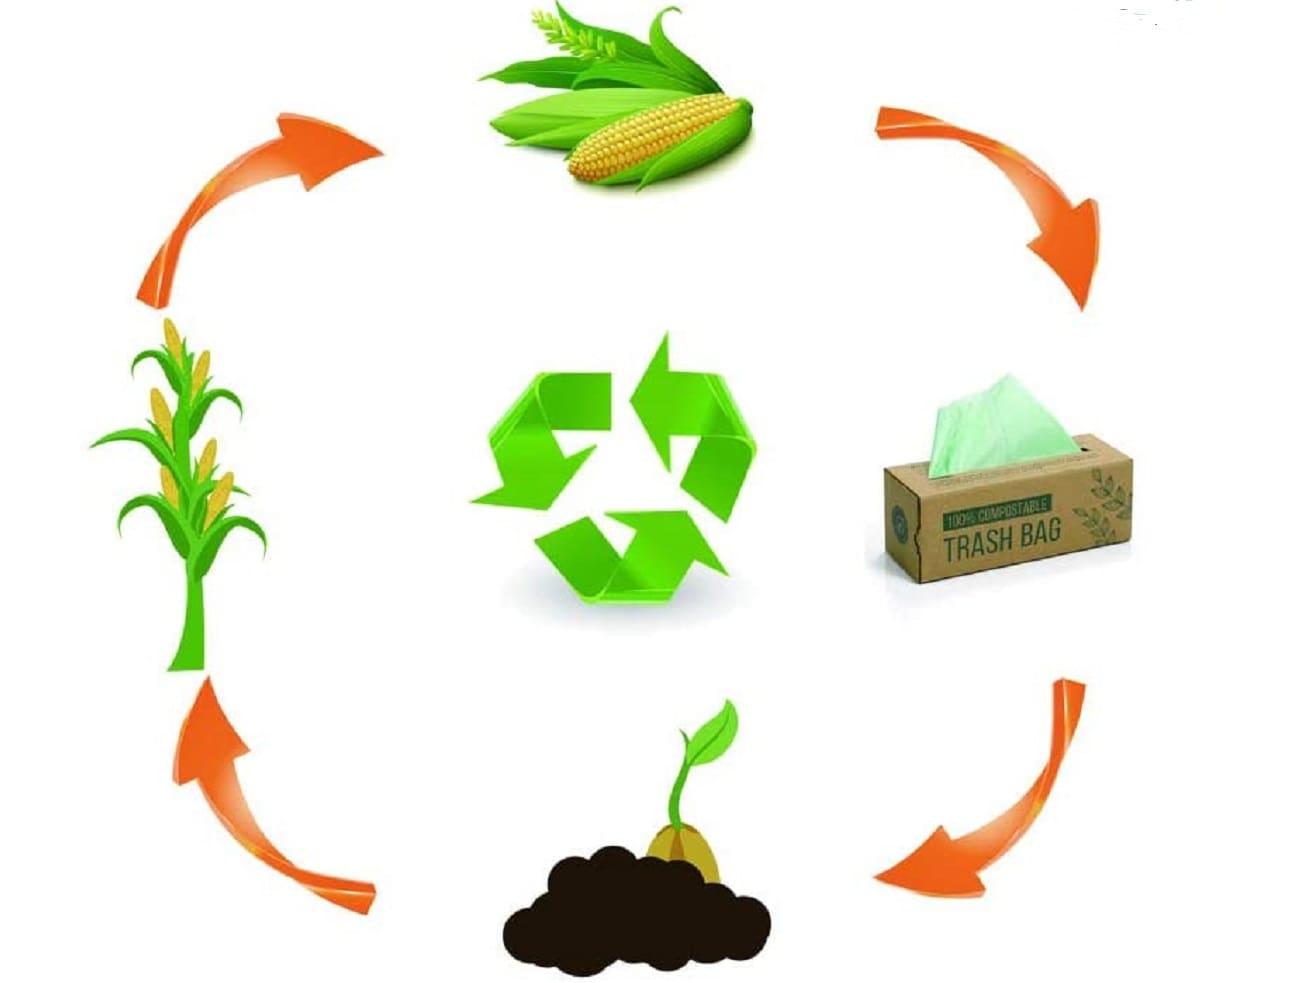 Biologisch abbaubare Müllbeutel